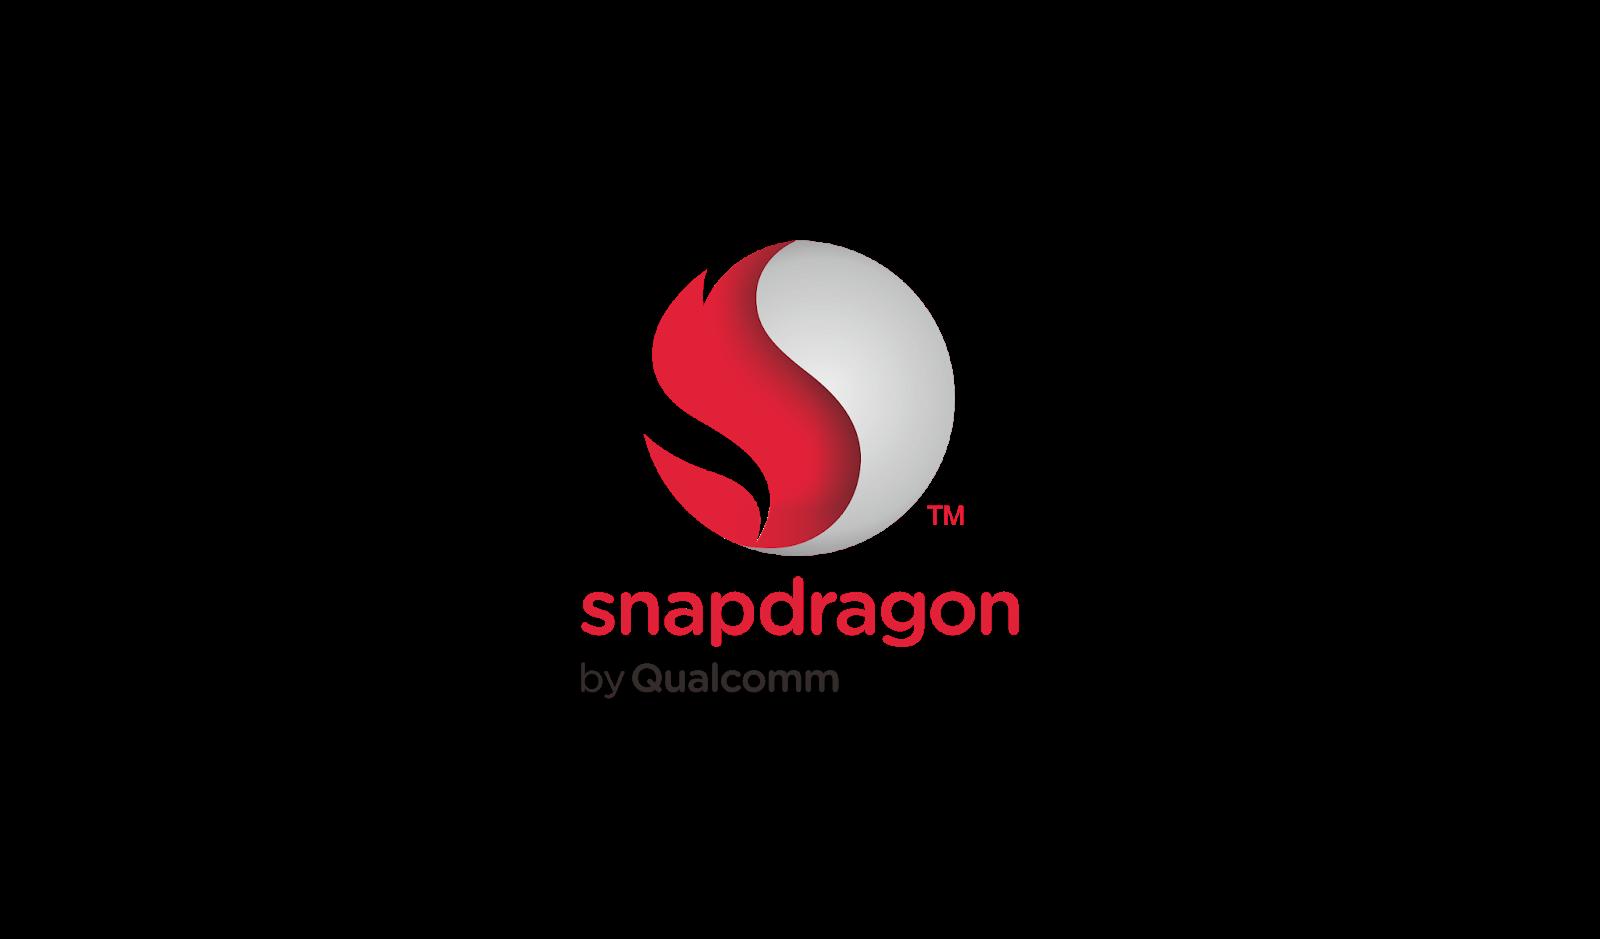 Vector Desain Qualcomm Logo Vector